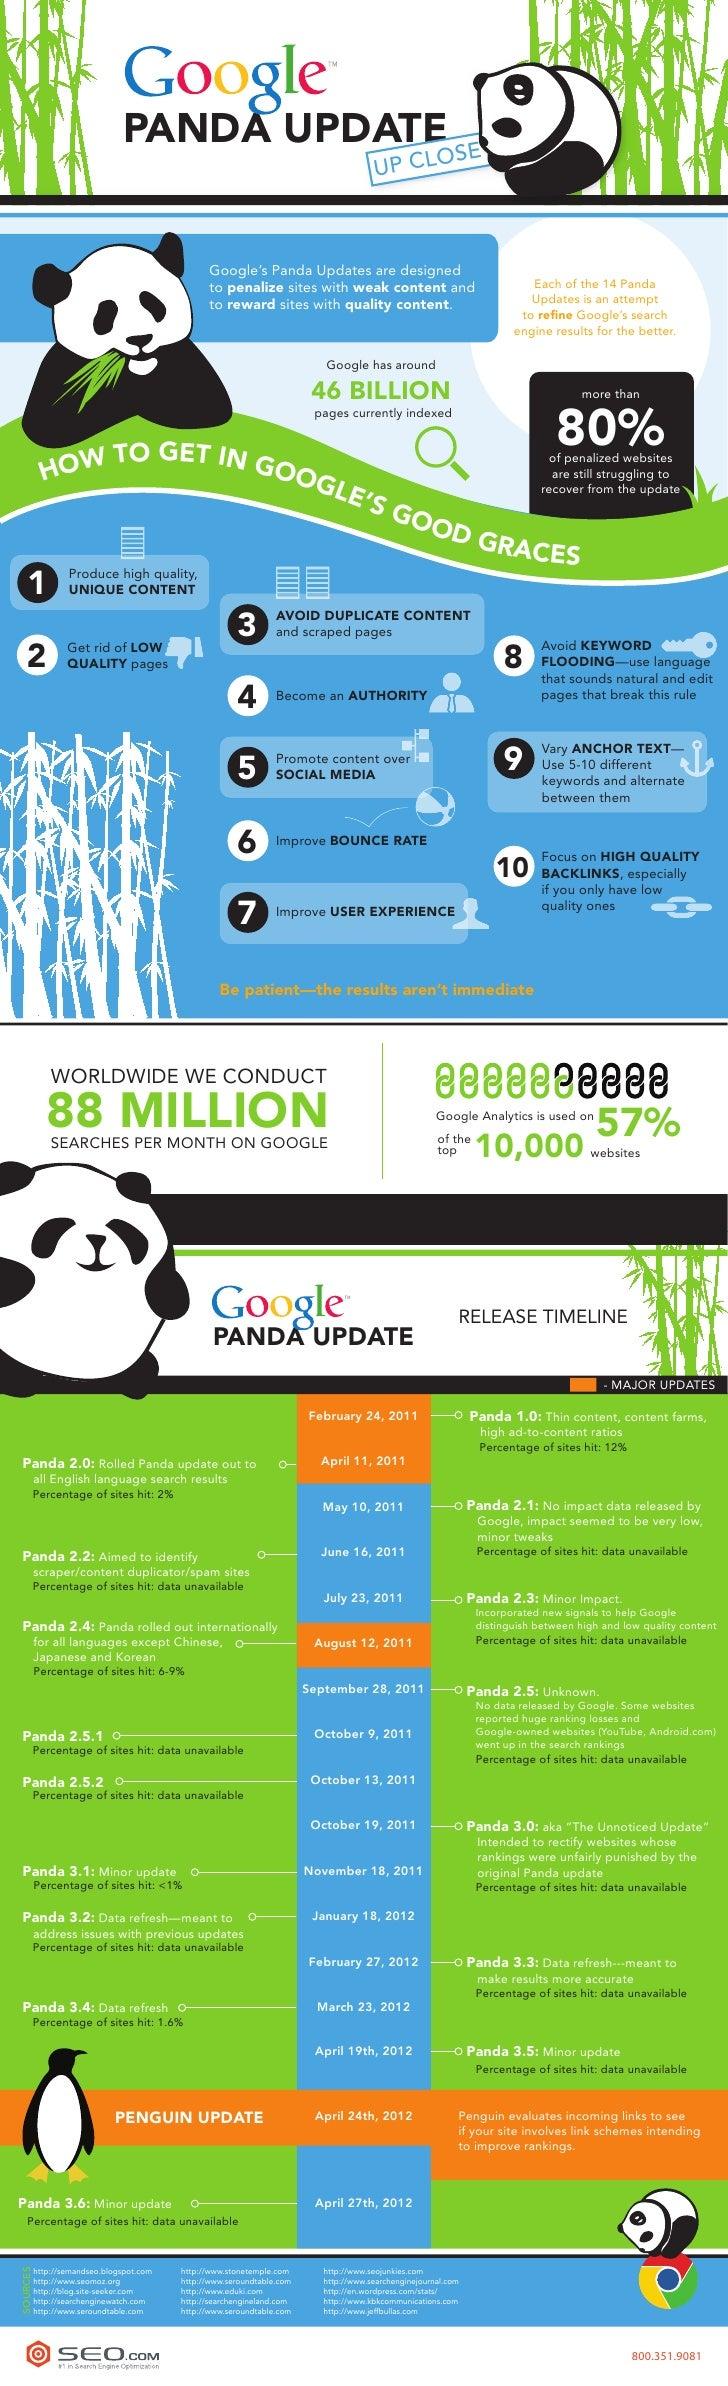 Google Panda Update Up Close - SEO.com Infographic